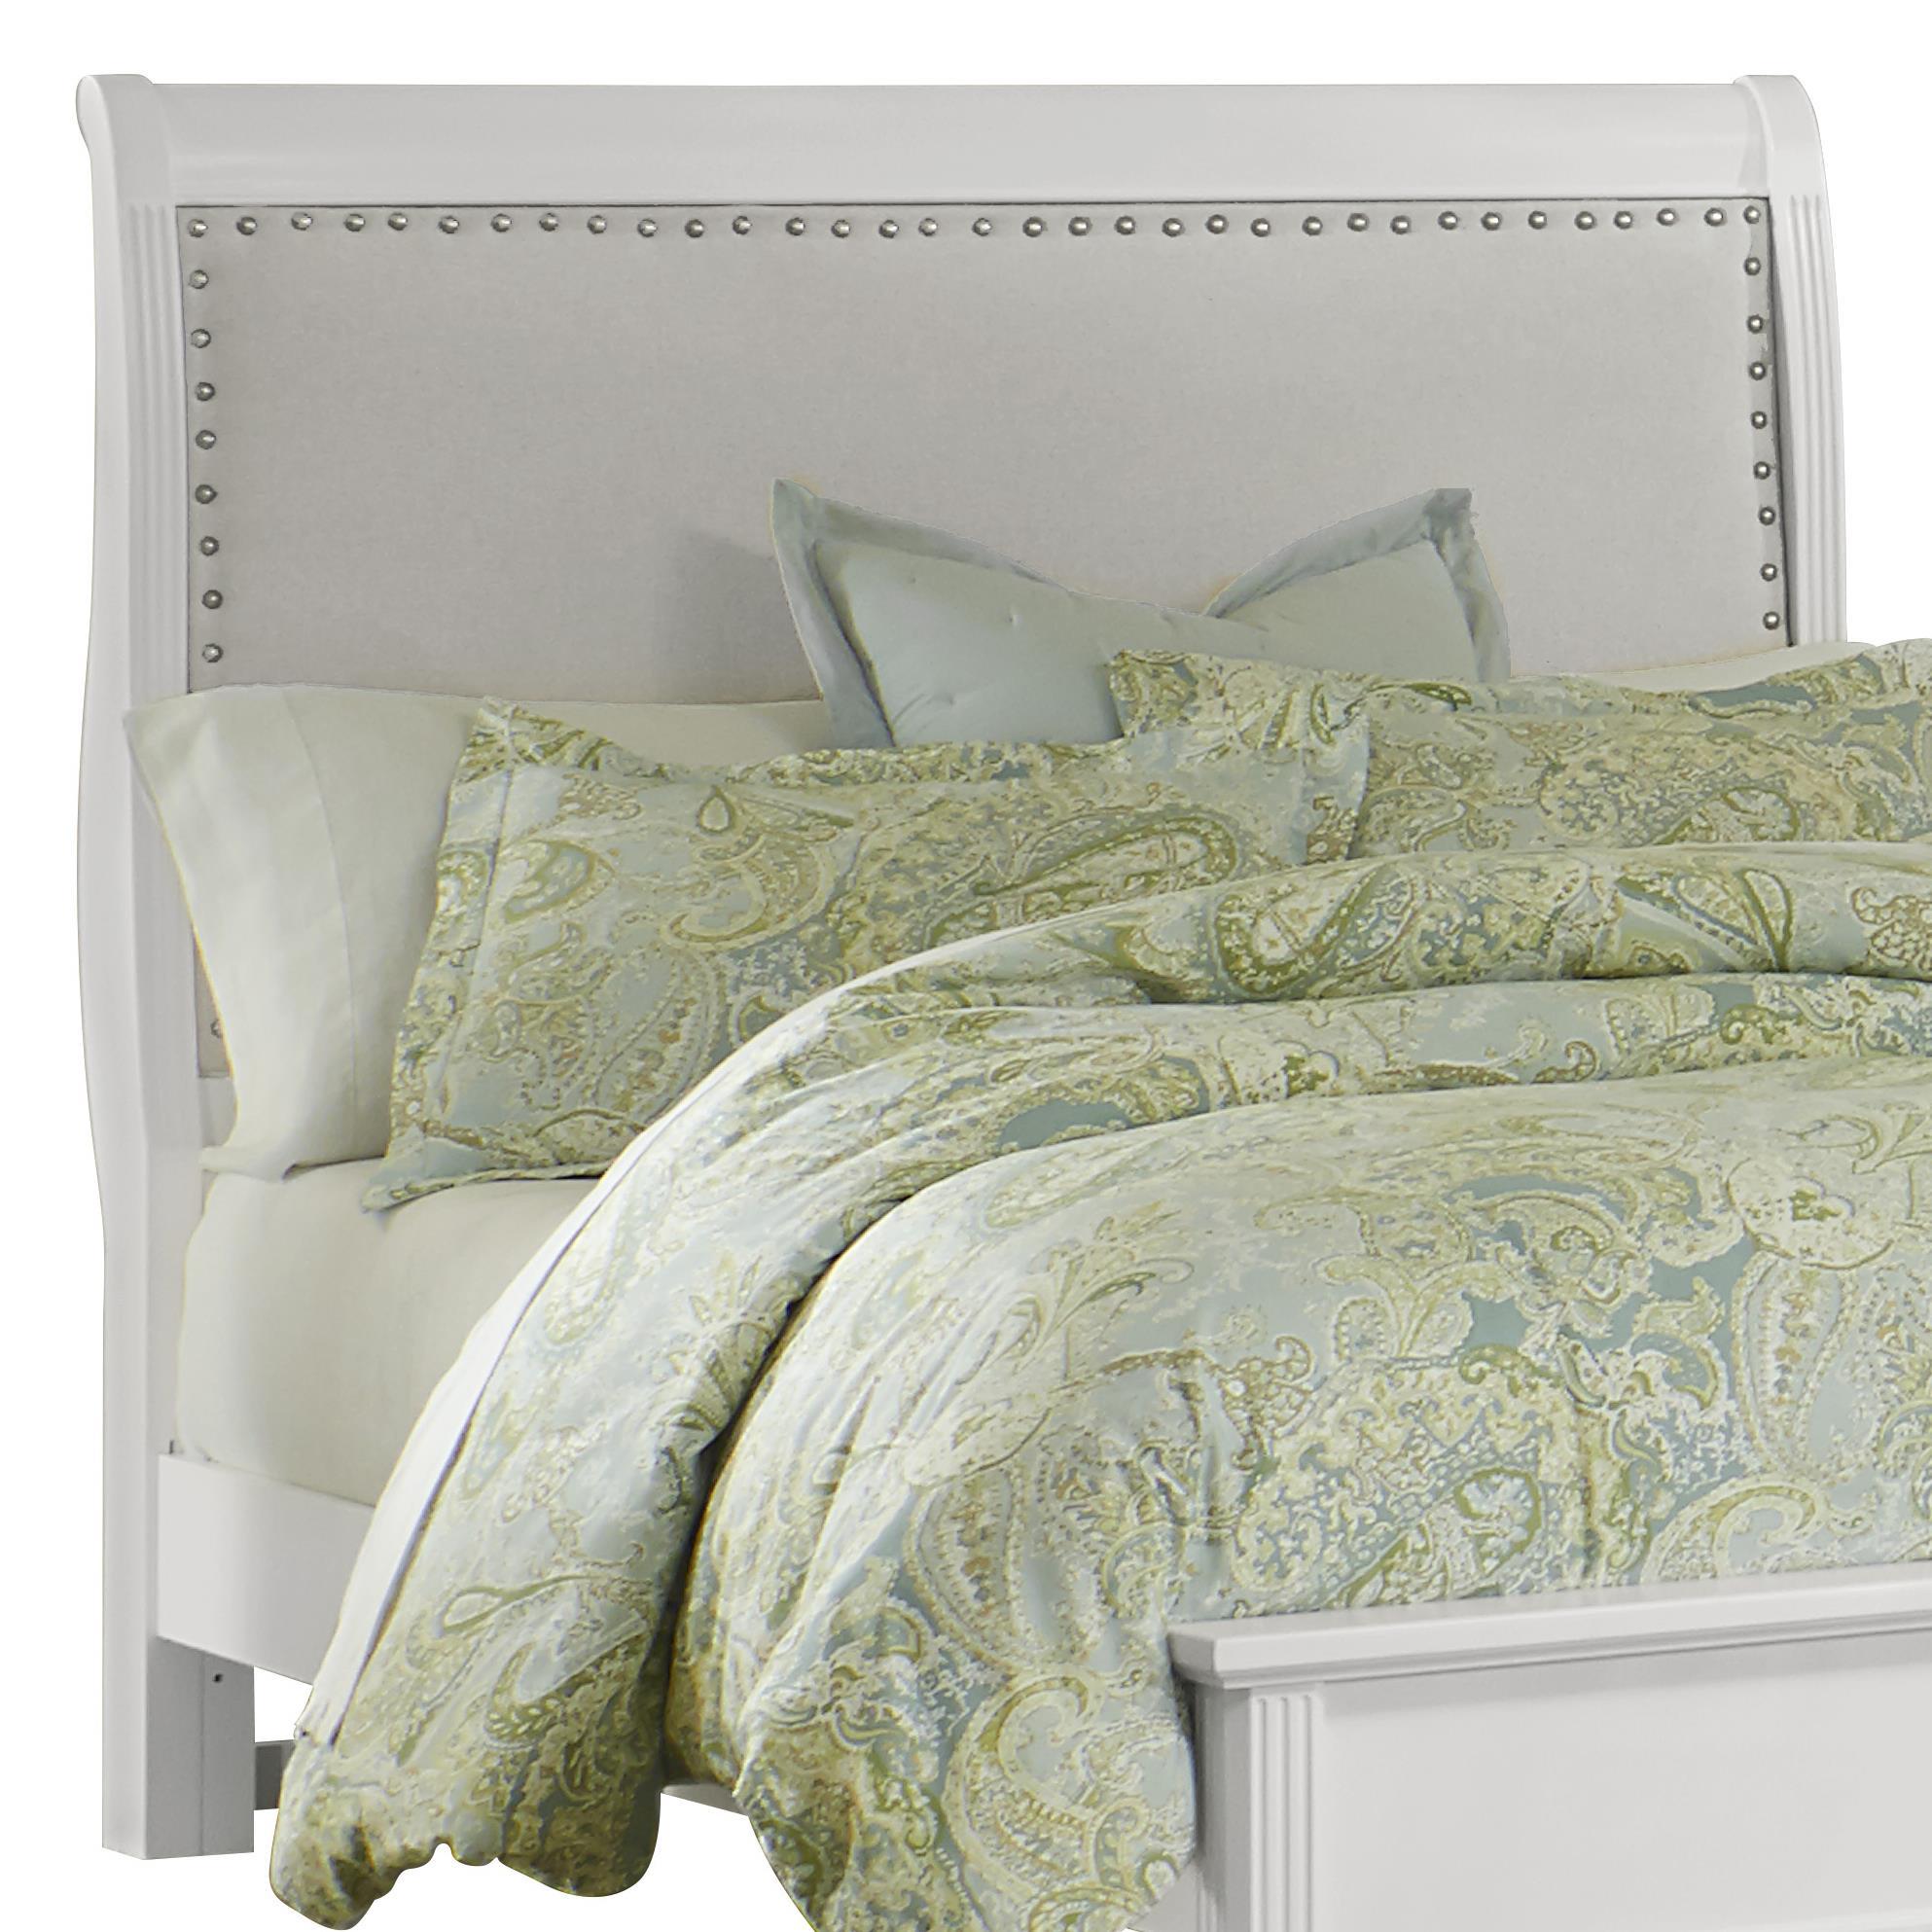 Vaughan Bassett French Market Queen Upholstered Headboard (Linen) - Item Number: 384-553